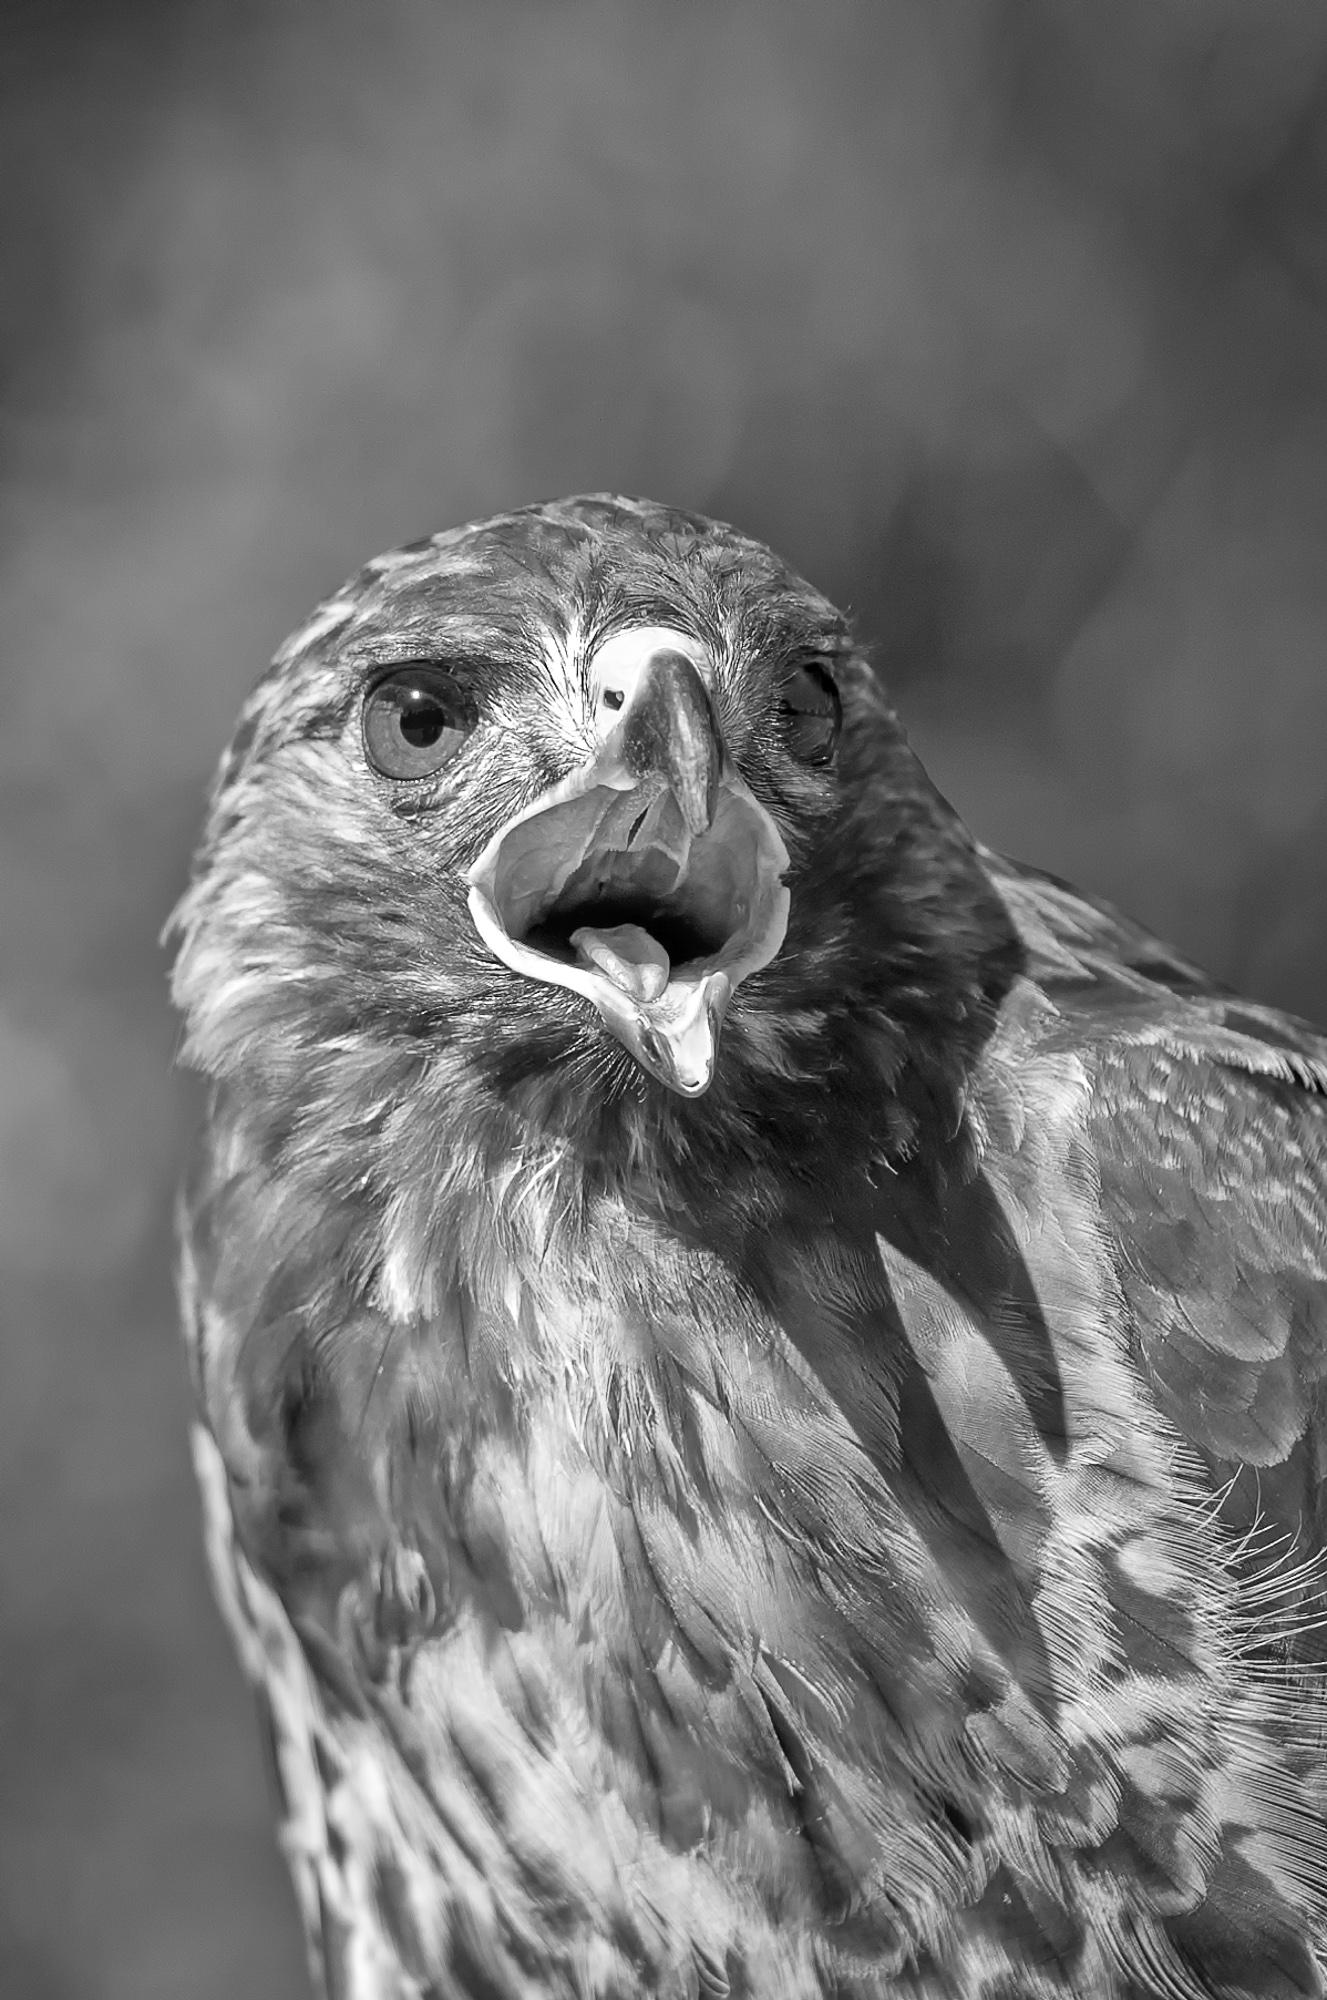 2014-10-18_Birds_Booker_0041-Edit-Edit-Edit-2-Edit.jpg